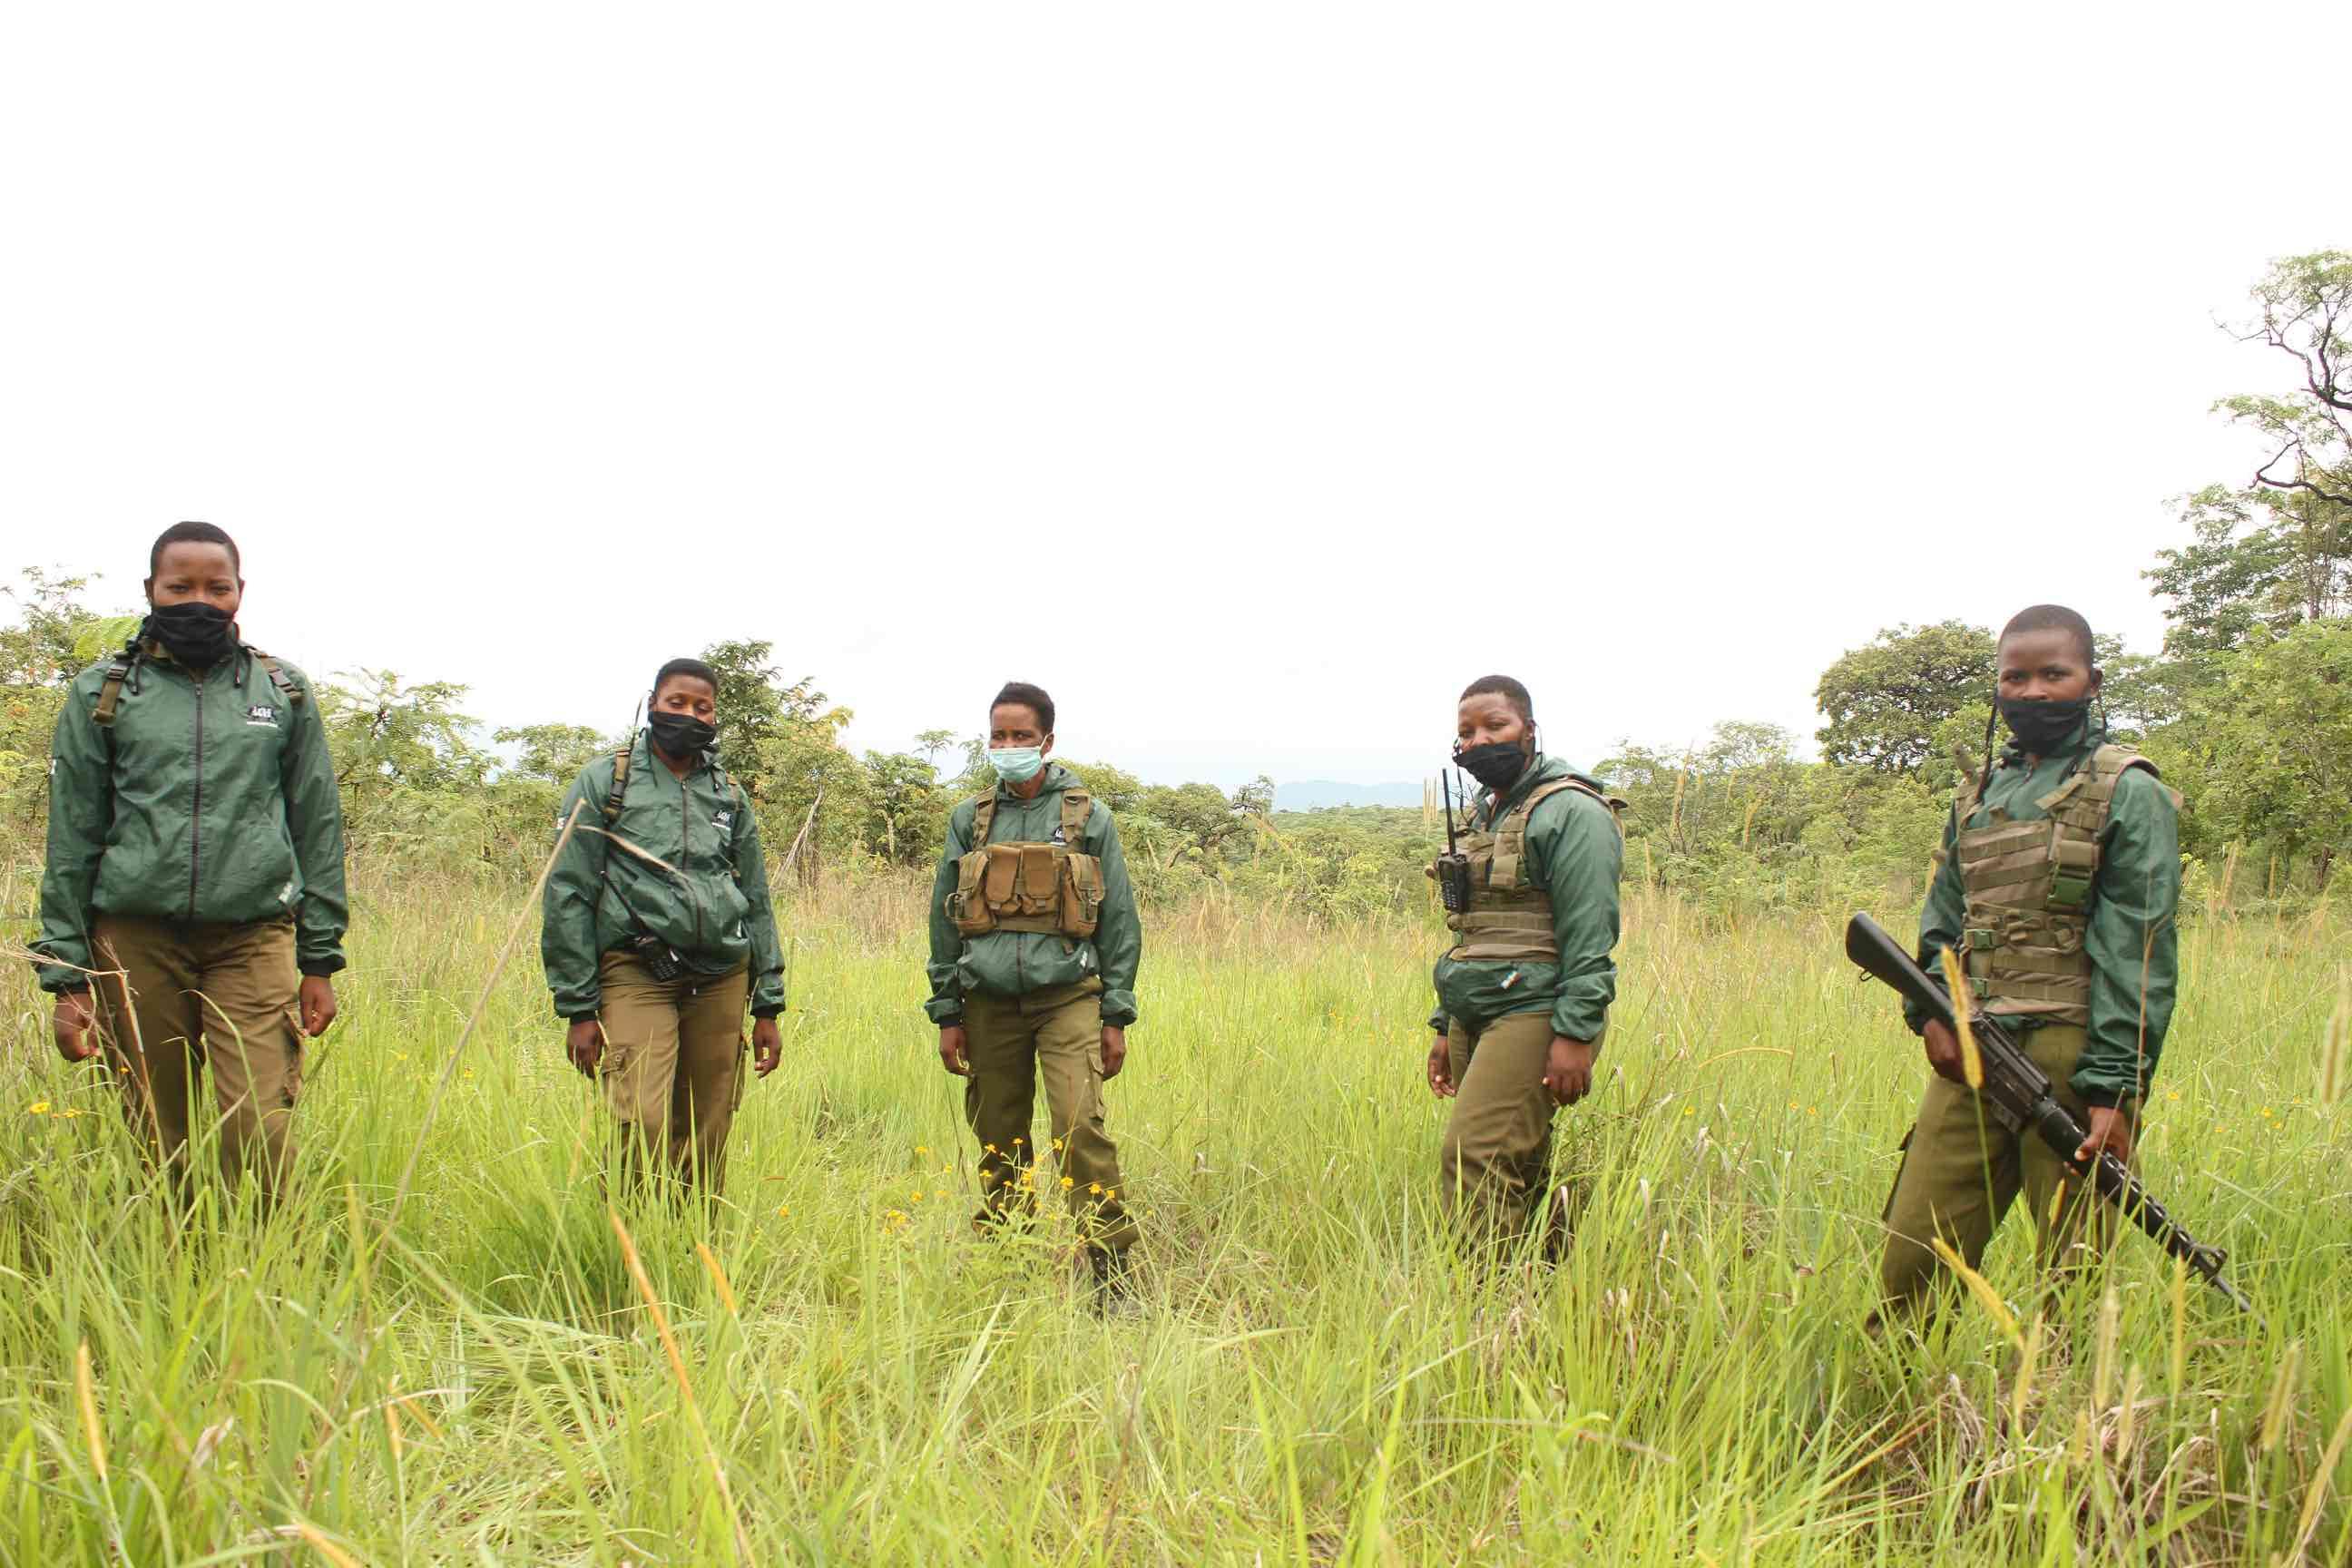 The Akashinga rangers on patrol in Phundundu wildlife area this week